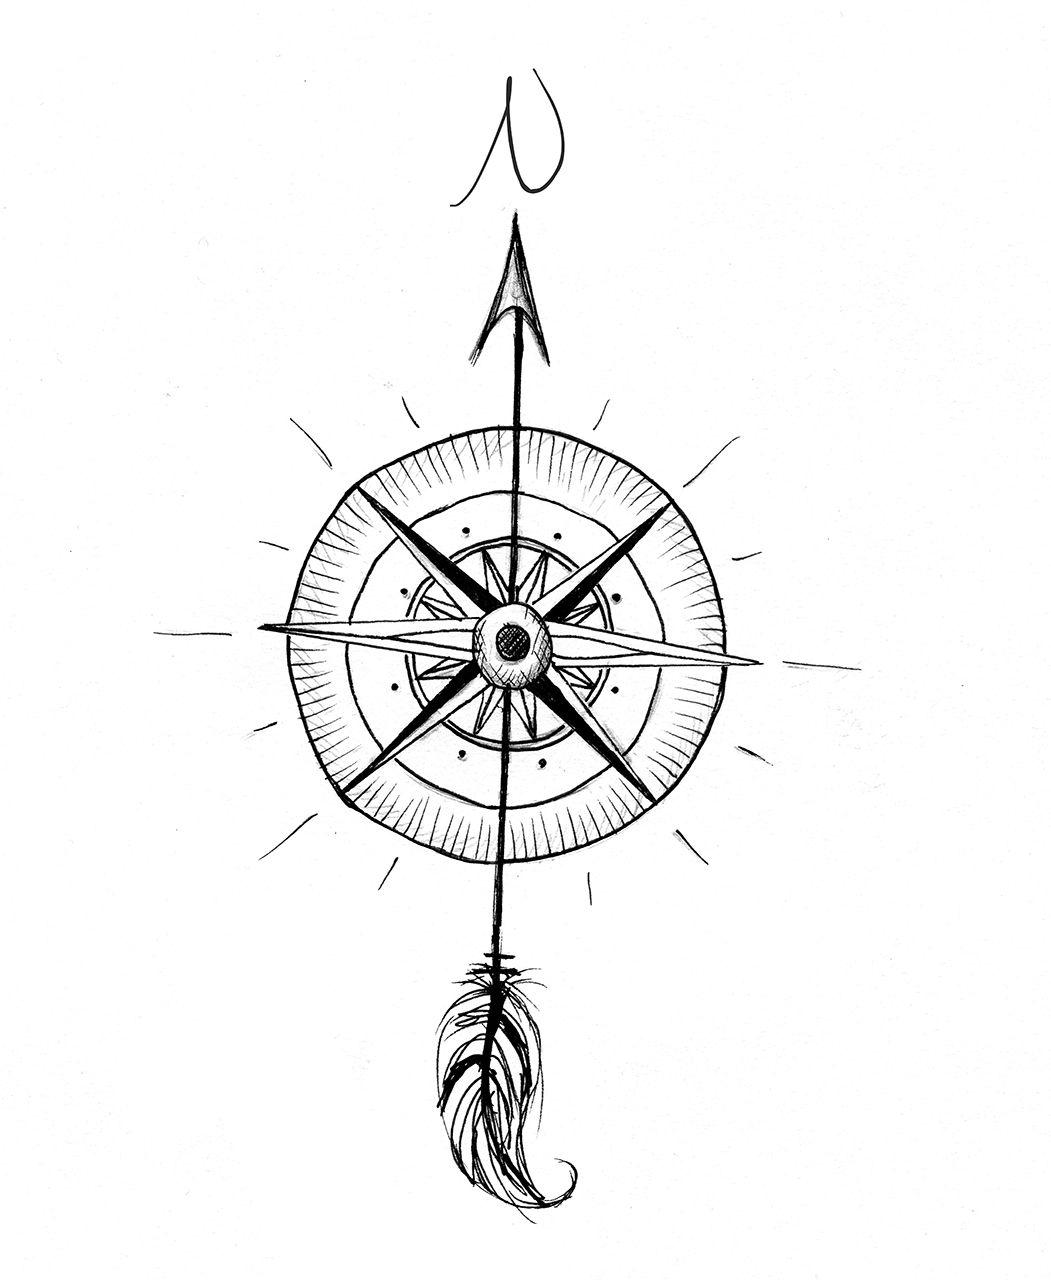 Custom Tattoo Designs - Contemporary Artist | Compass tattoo ...